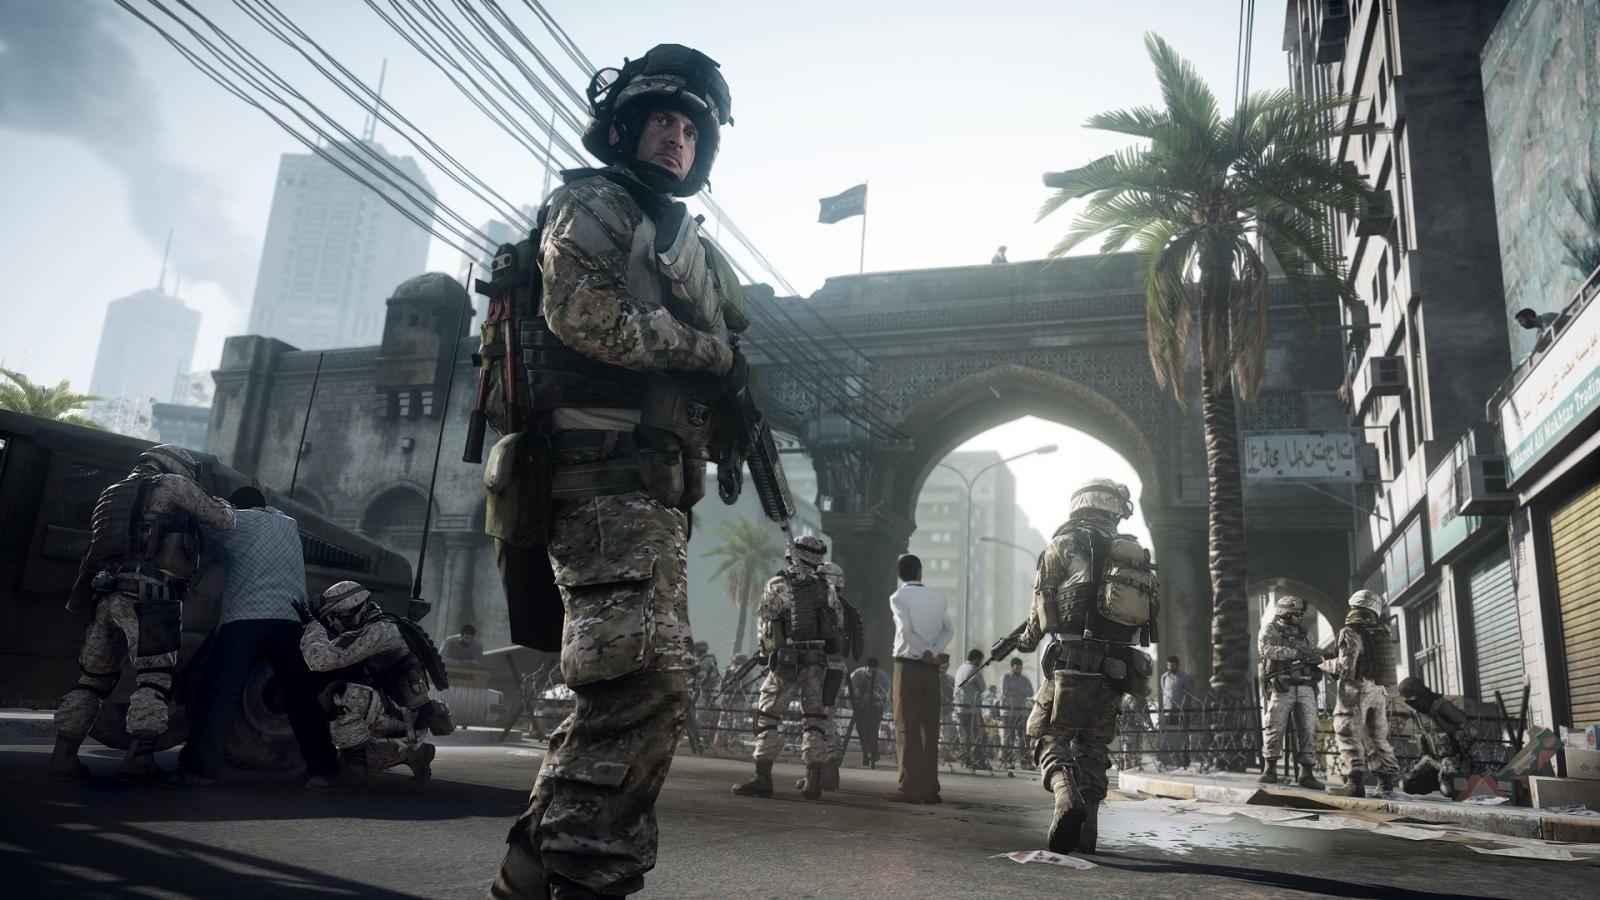 Battlefield 3 Battlefield 3 Battlefield 4 Battlefield 3 Pc